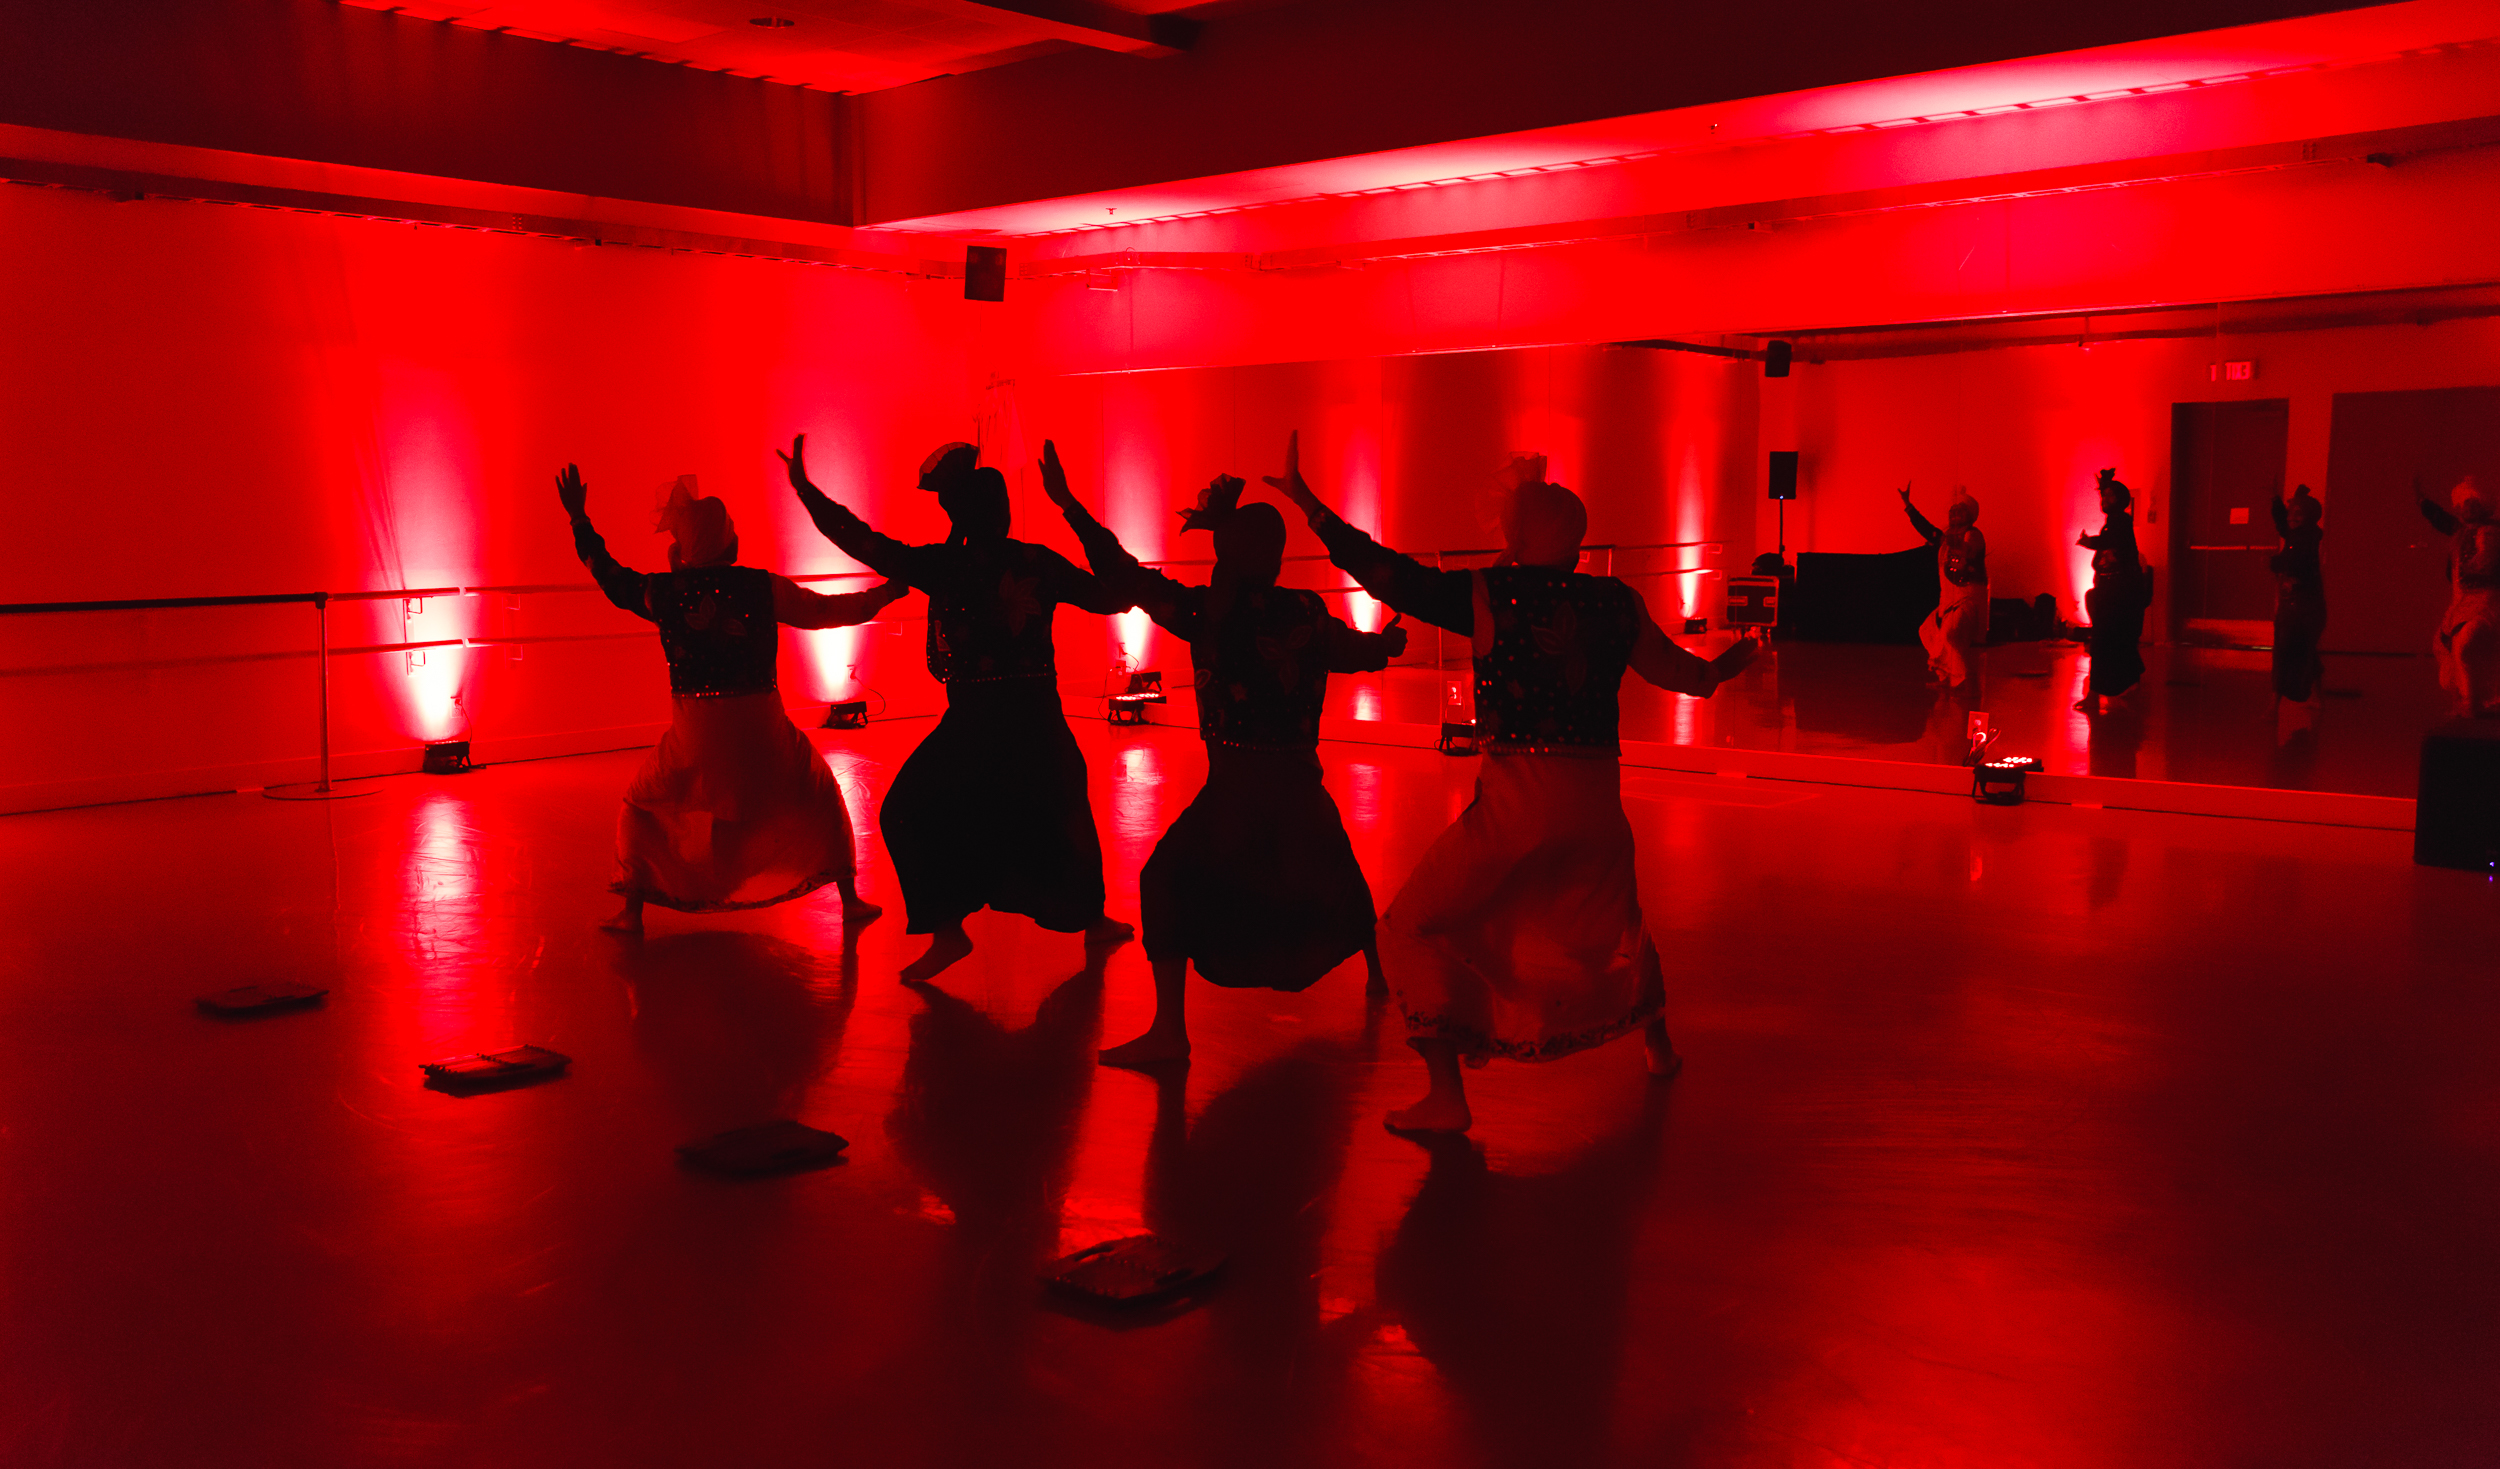 Scotiabank-Dance-Hotel-image14.jpg